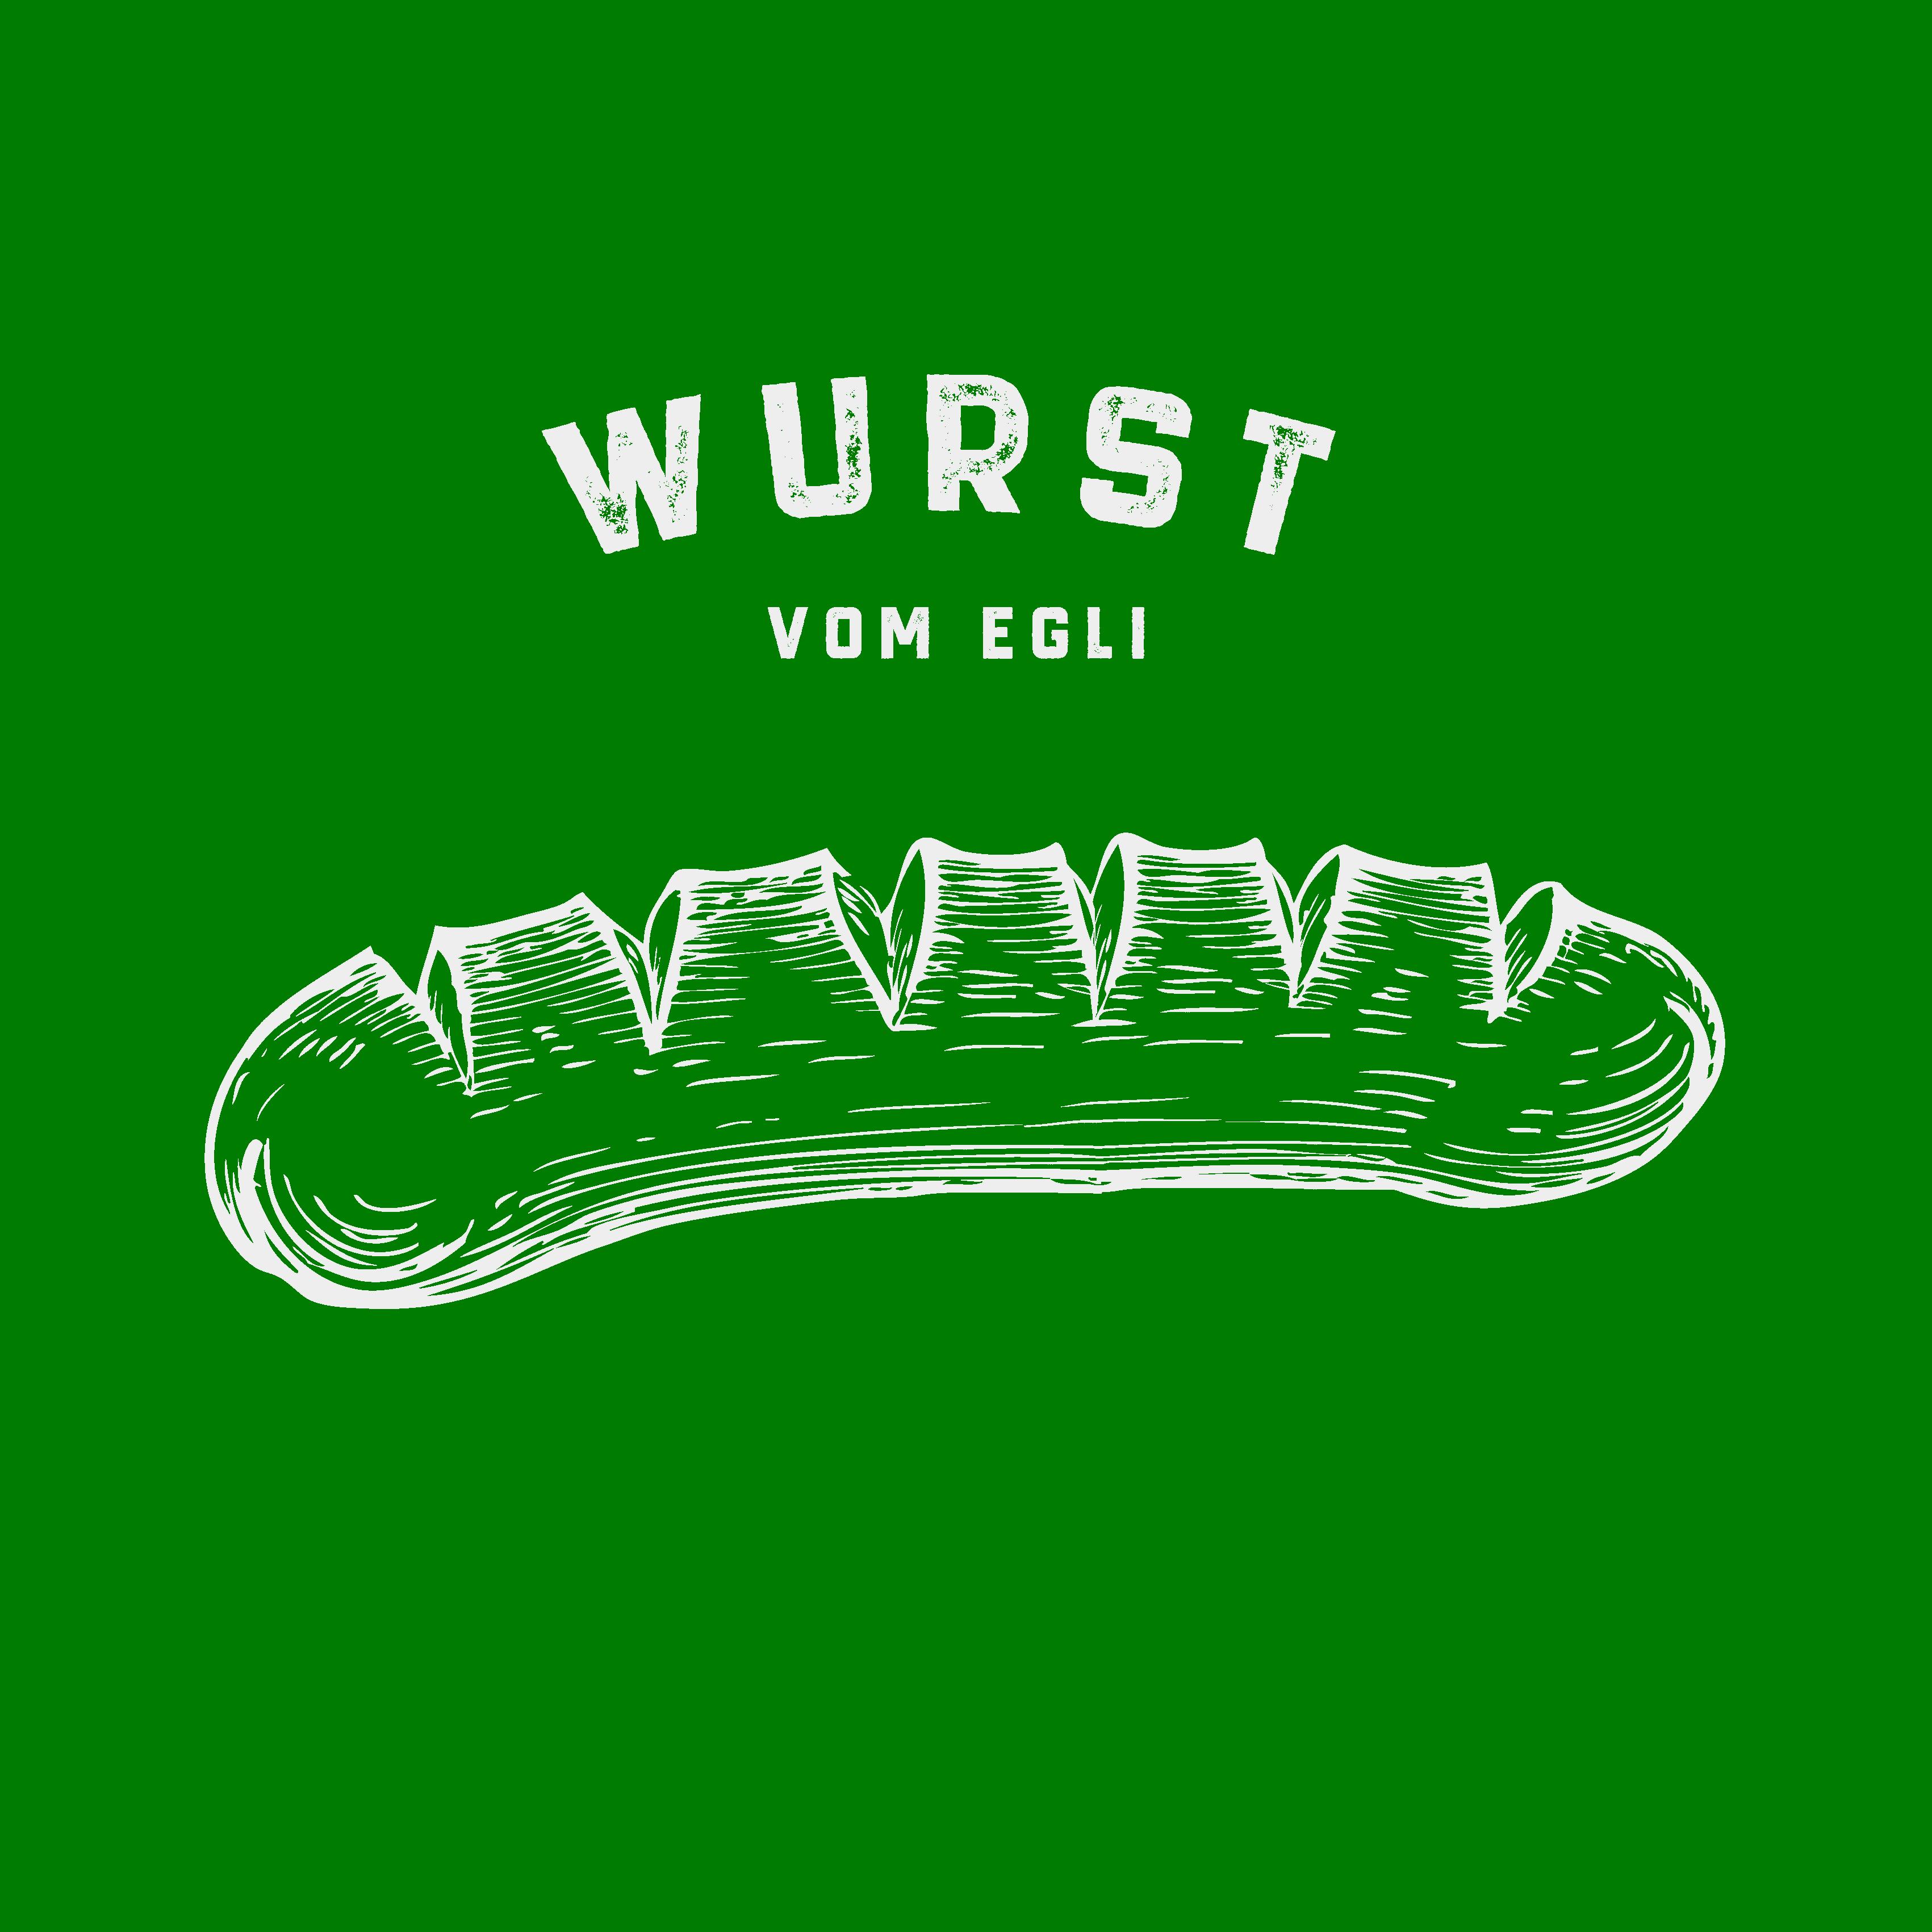 FT LABEL FOOD DE WURST